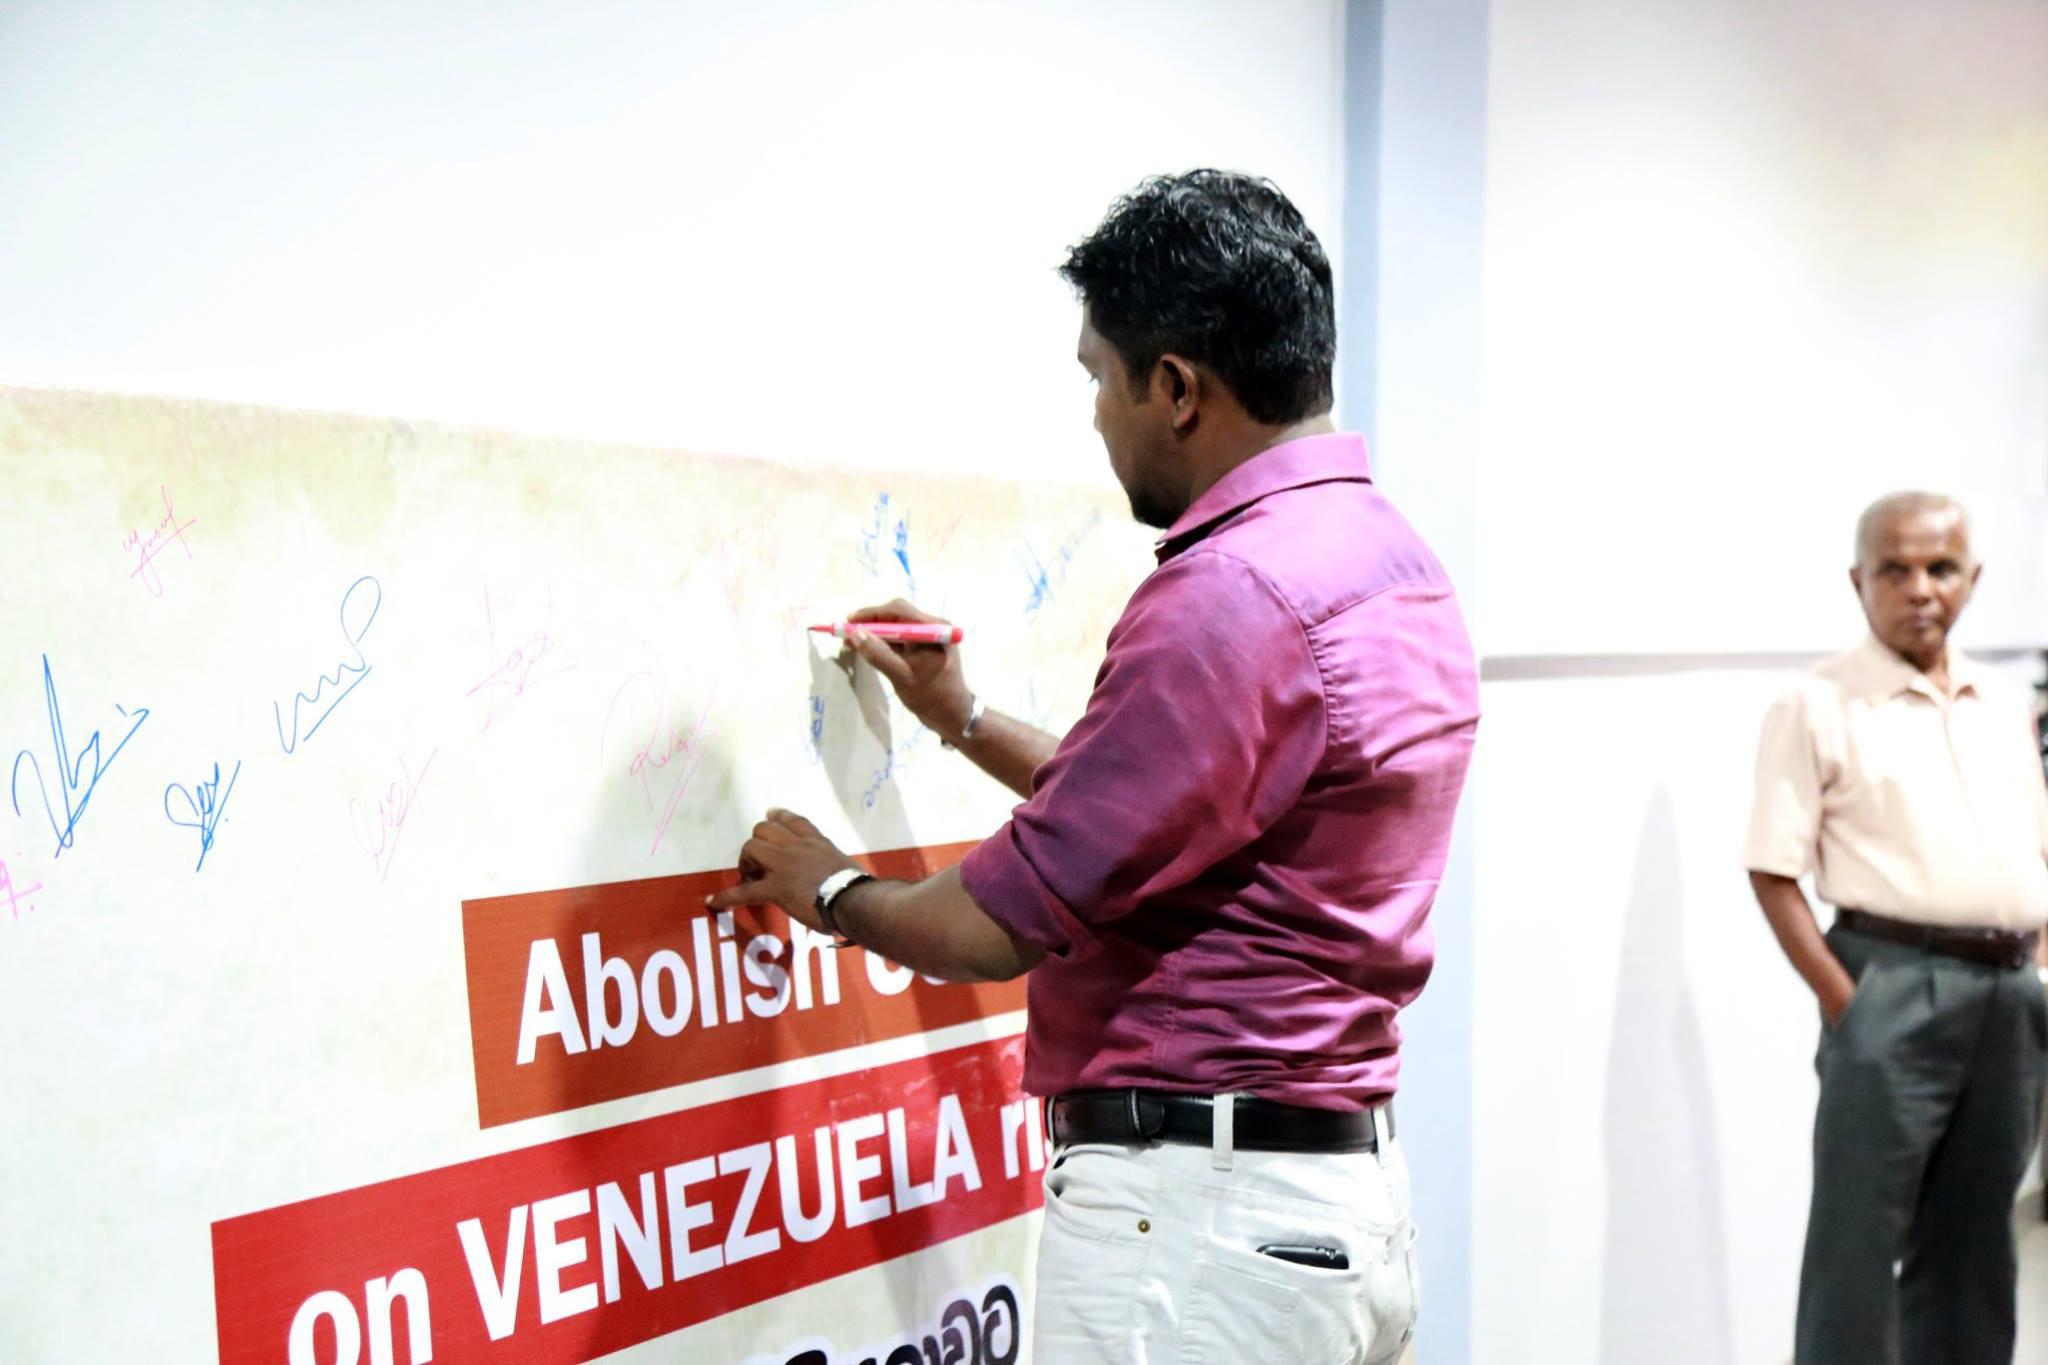 Venezuela-with-Sri-Lanka-2018.05.01-7